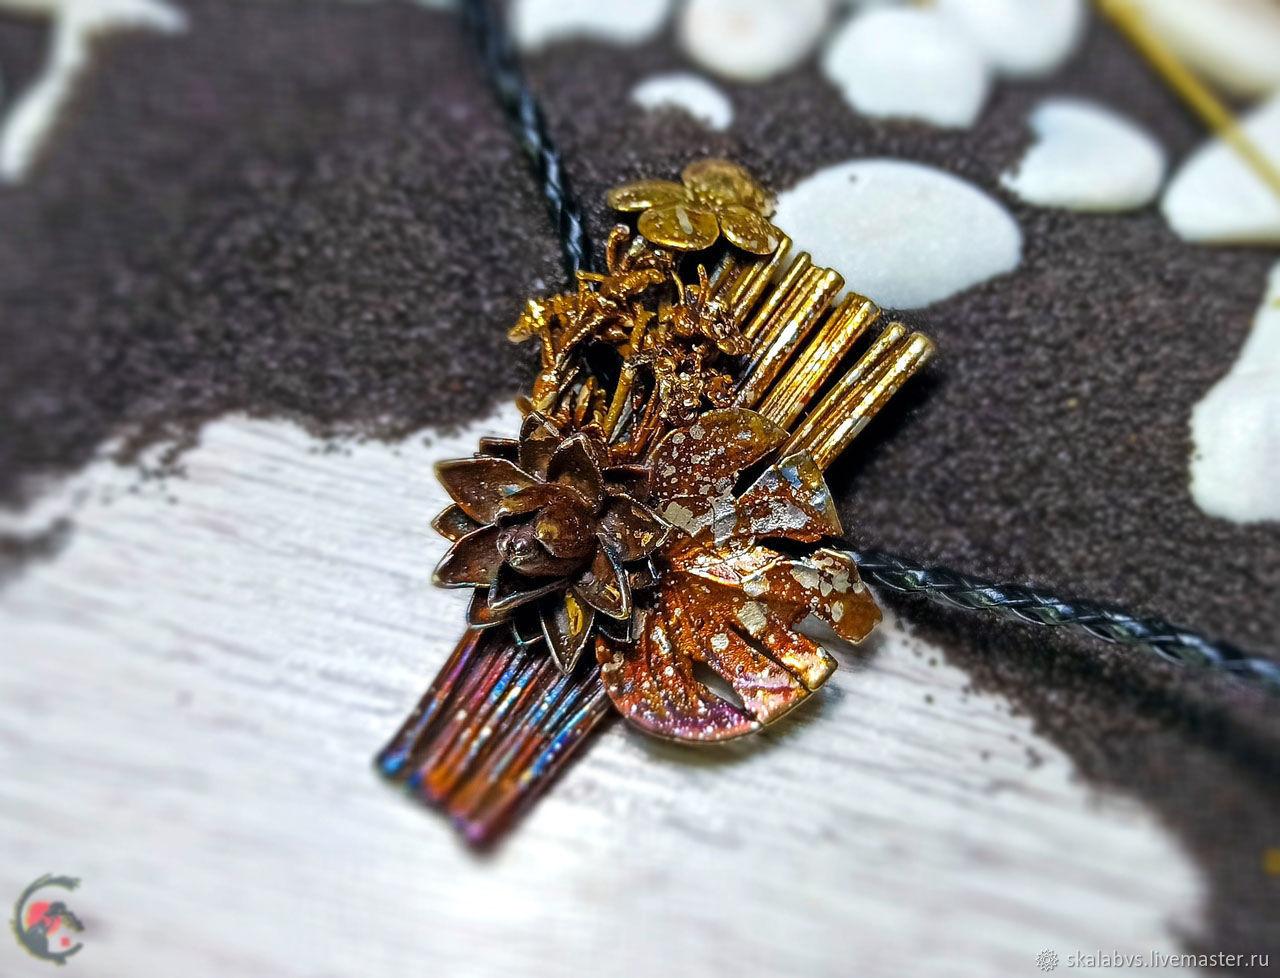 'Velum' pendant made of a bouquet of various flowers!, Pendants, Chelyabinsk,  Фото №1